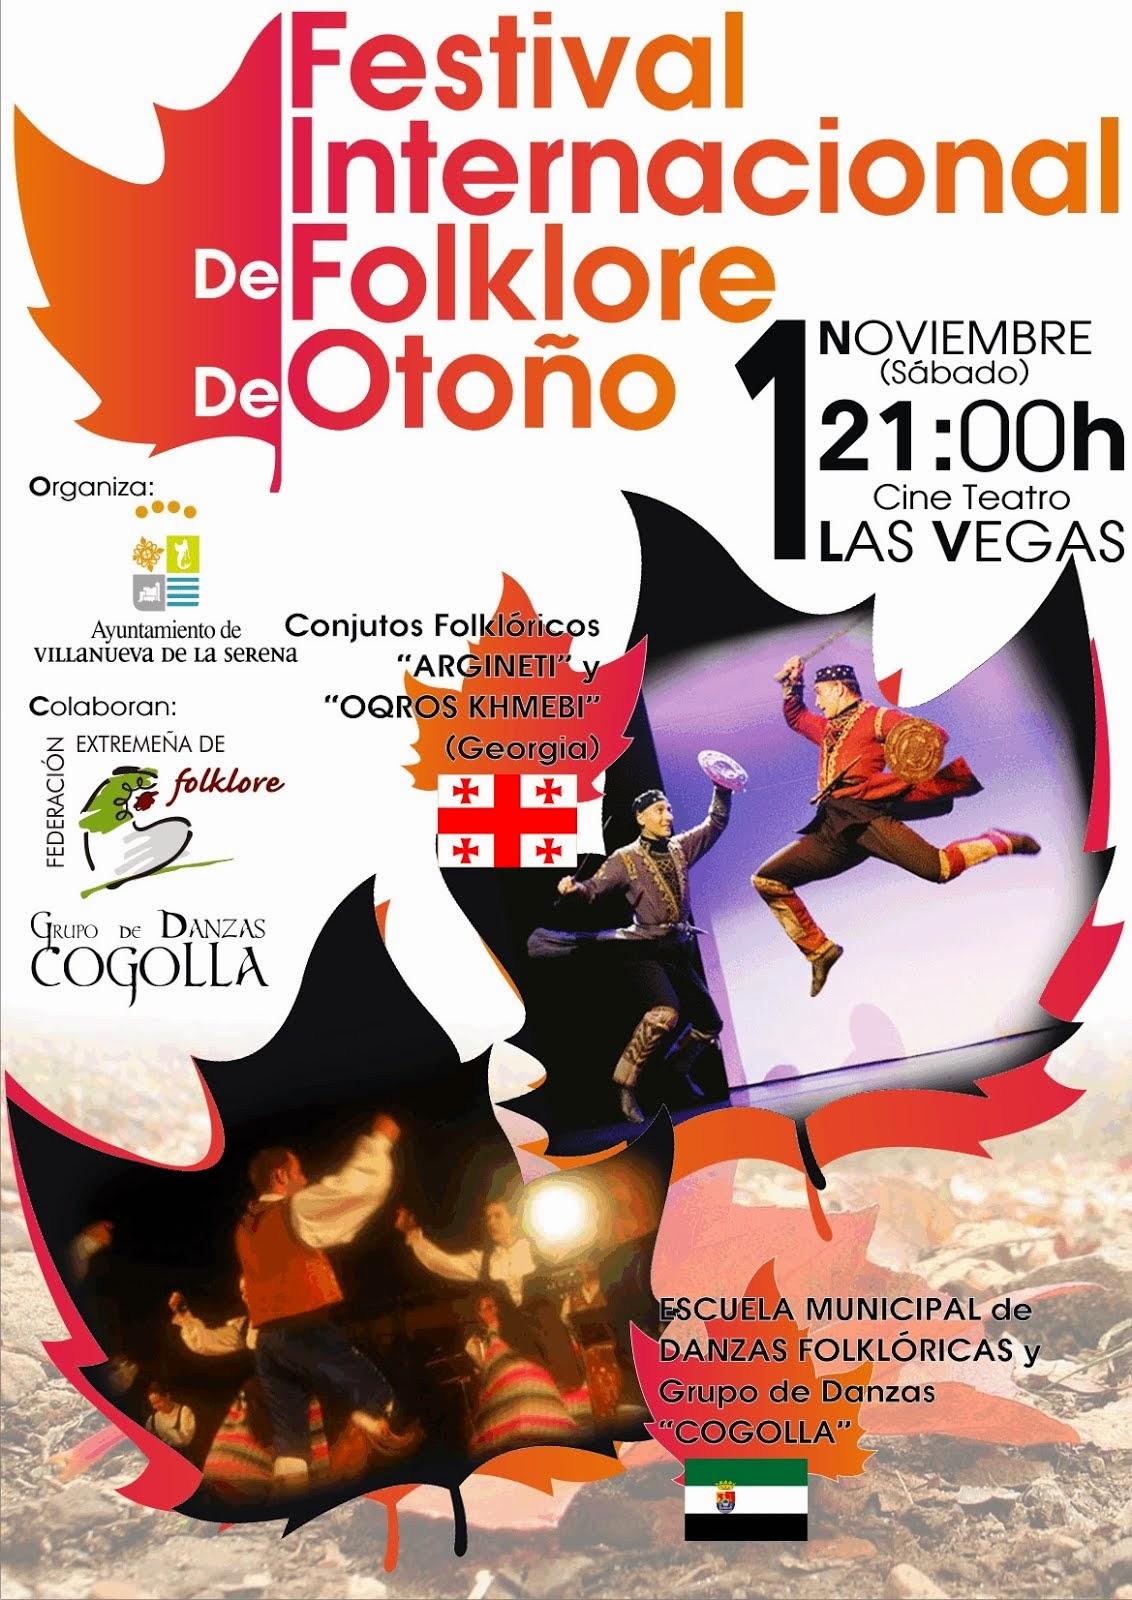 Festival Internacional de Folclore Otoño